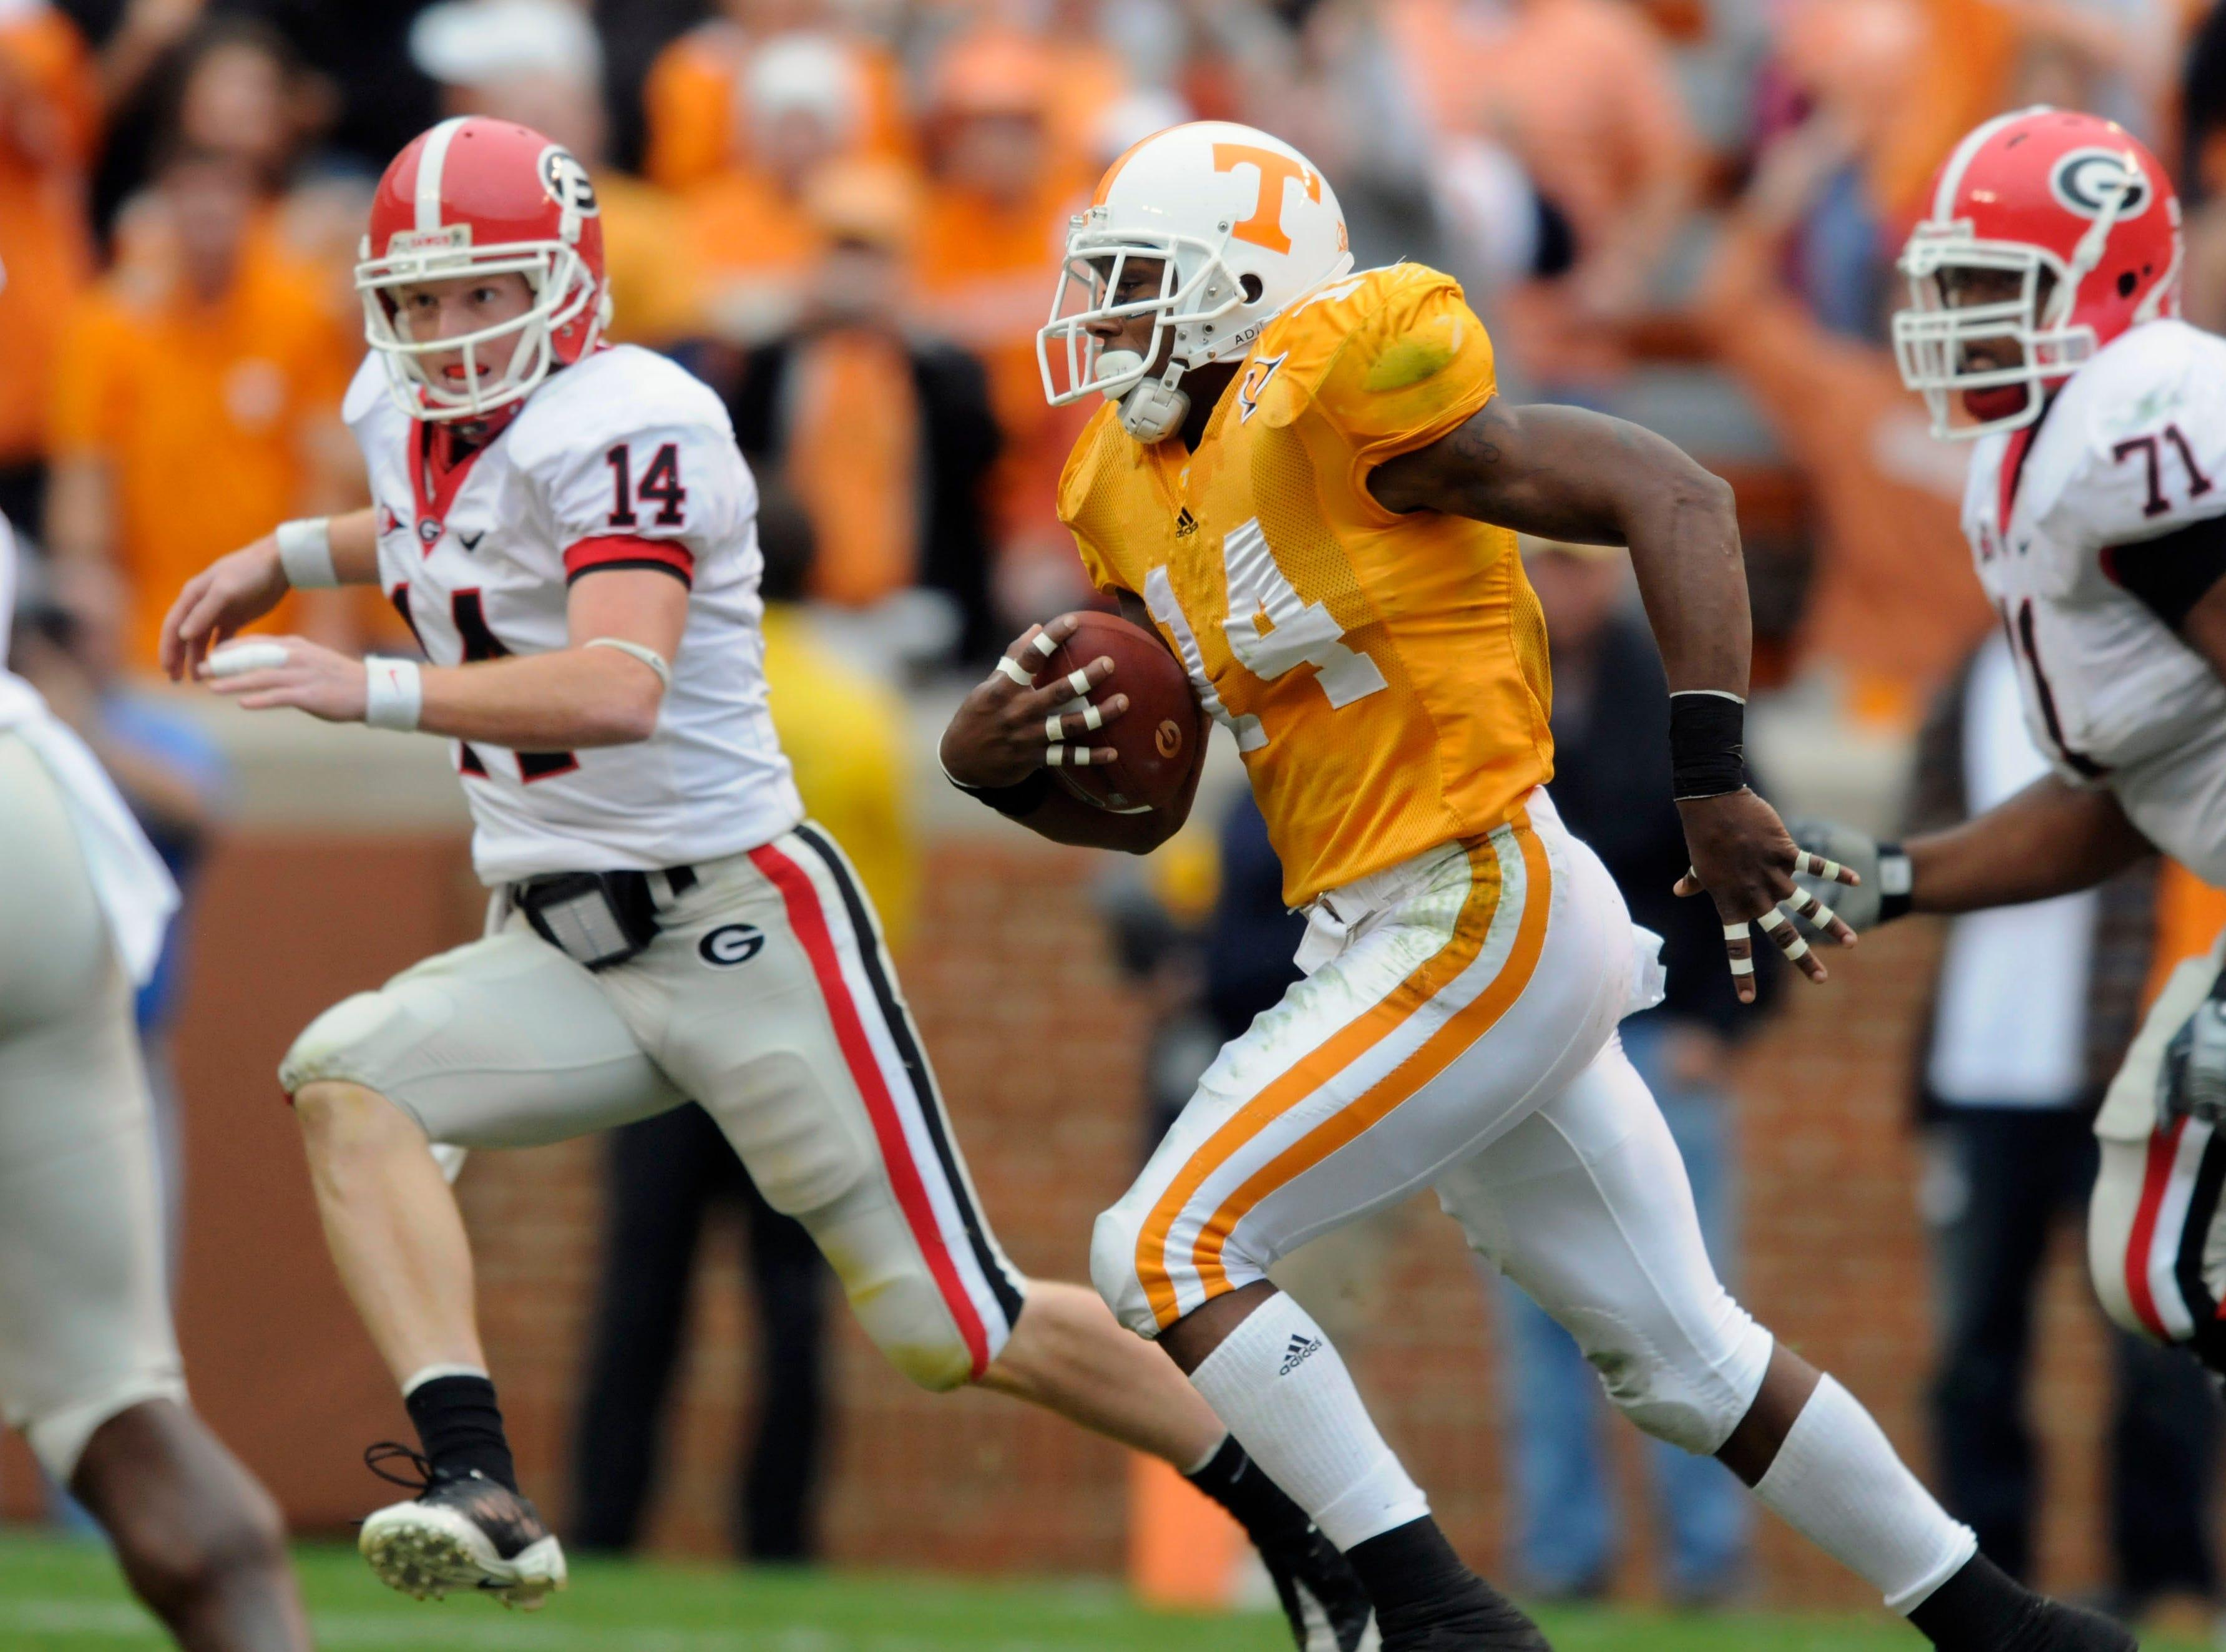 Tennessee cornerback Eric Berry (14) returns an interception/fumble return 46-yards with Georgia quarterback Joe Cox (14) and offensive tackle Cordy Glenn (71) in pursuit on Saturday, Oct. 10, 2009 at Neyland Stadium.